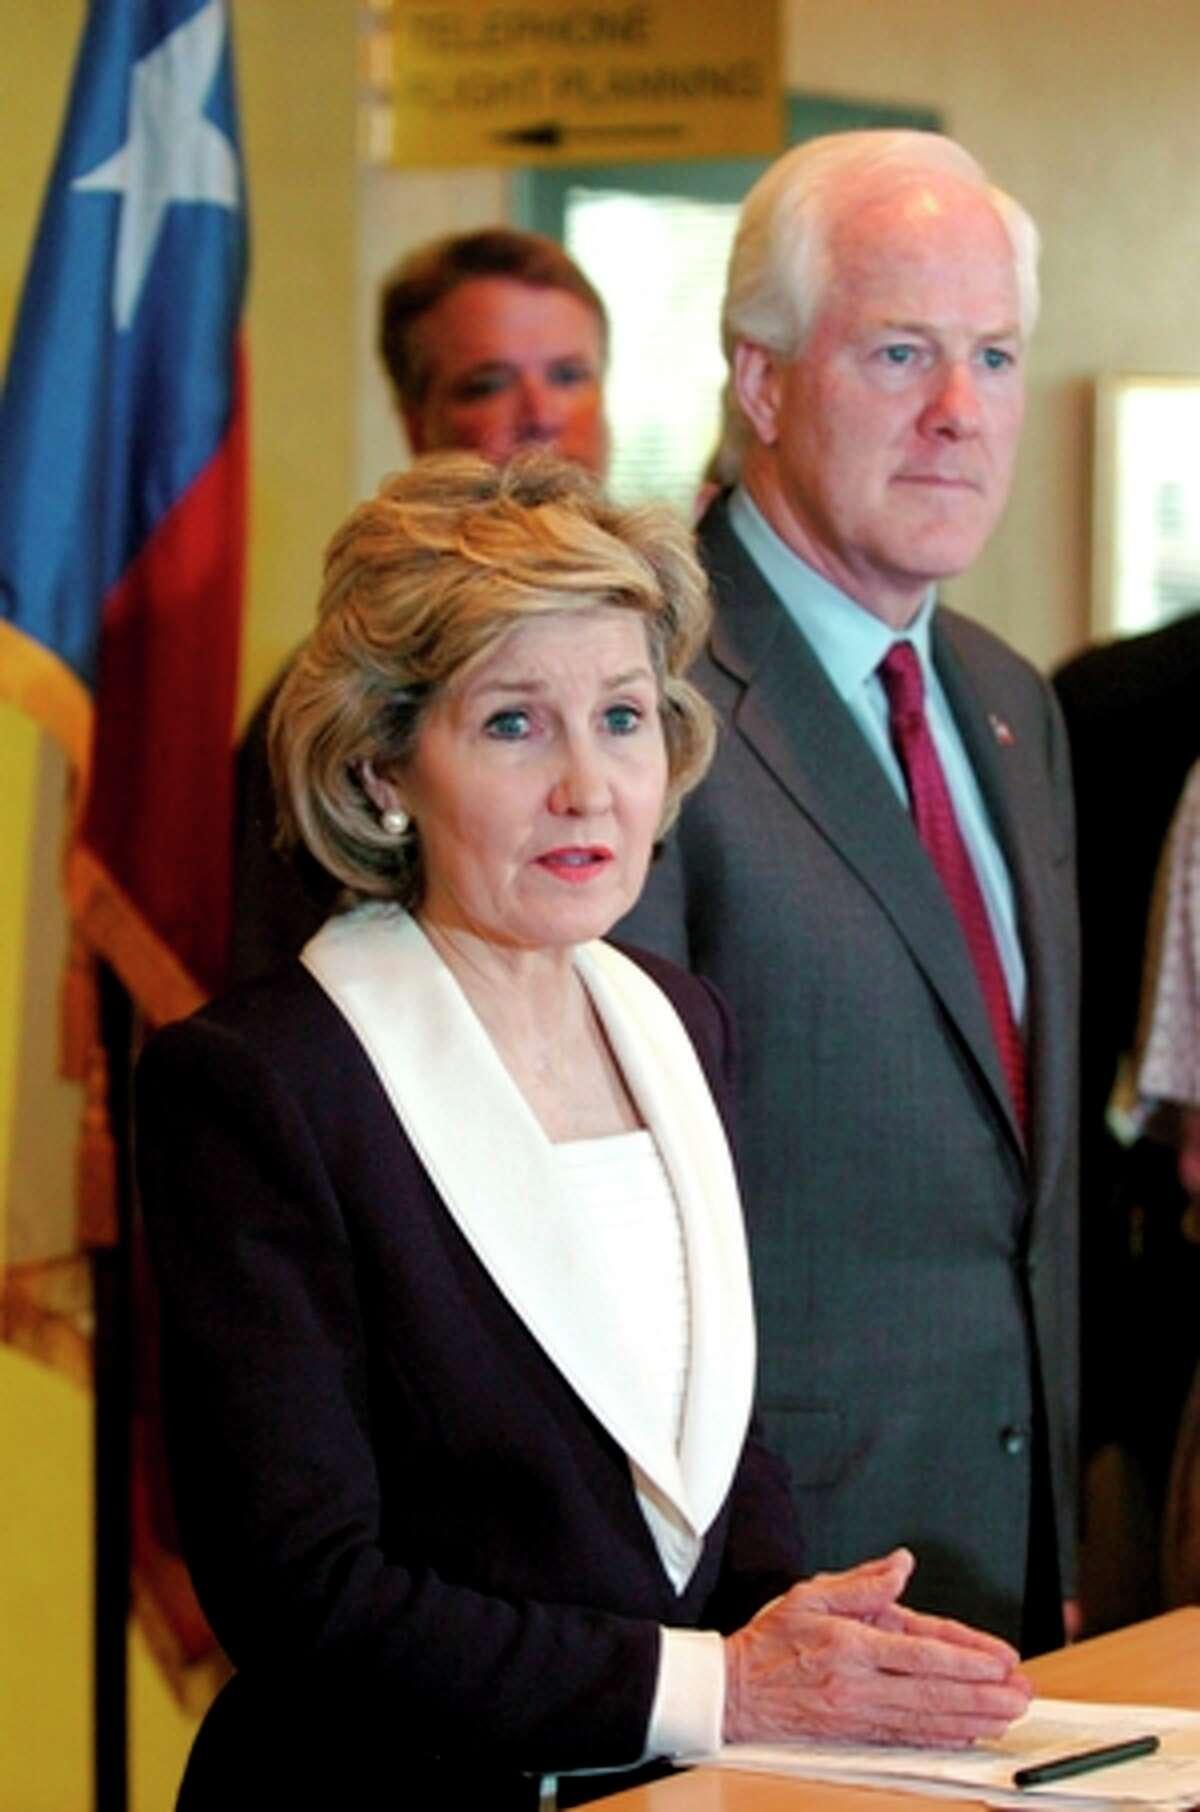 Texas Senators Kay Bailey Hutchison and John Cornyn urged President Barack Obama to beef up border security.